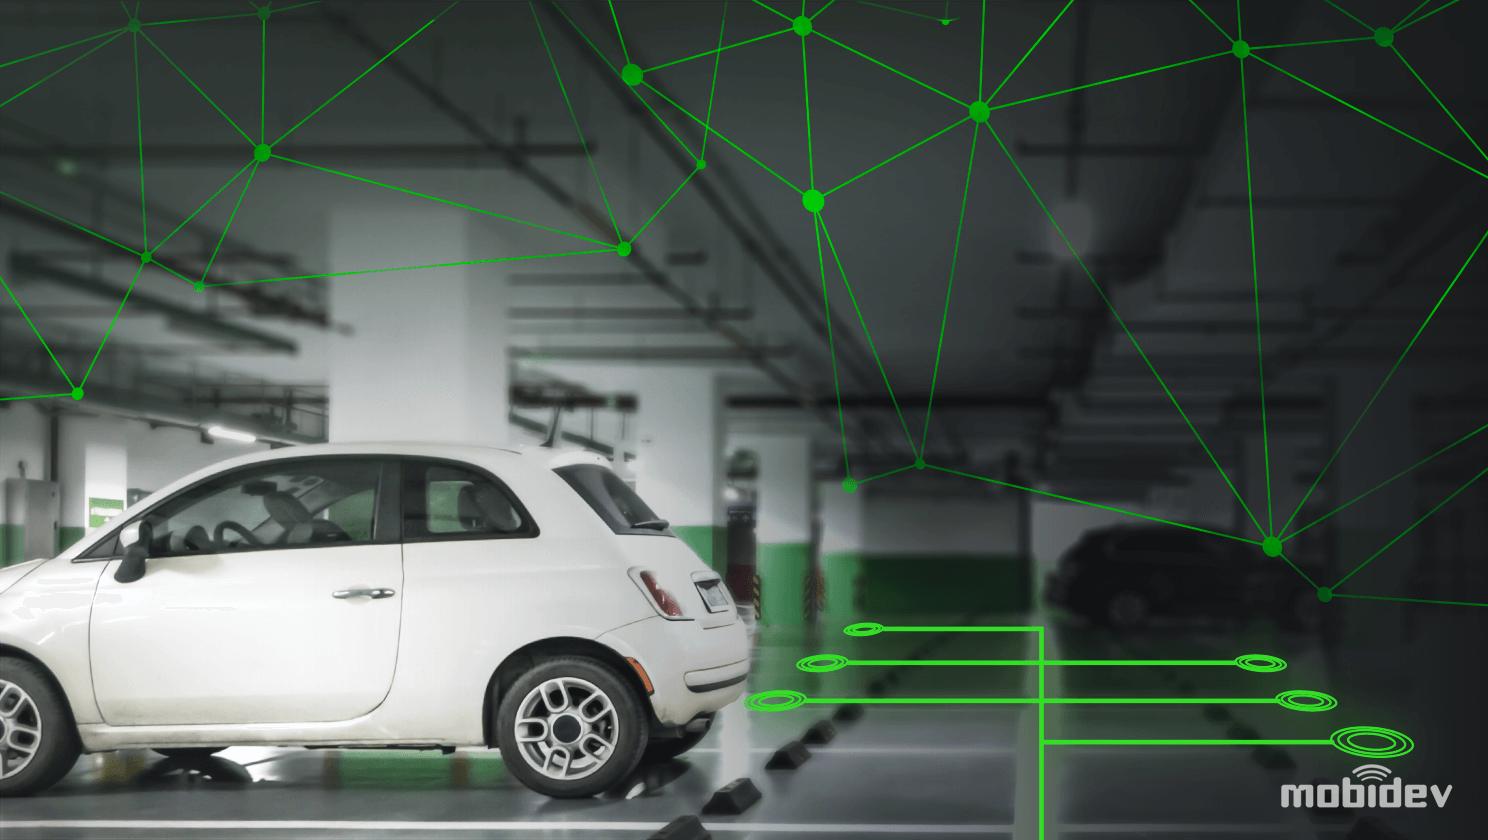 IoT-based Smart Parking System Development